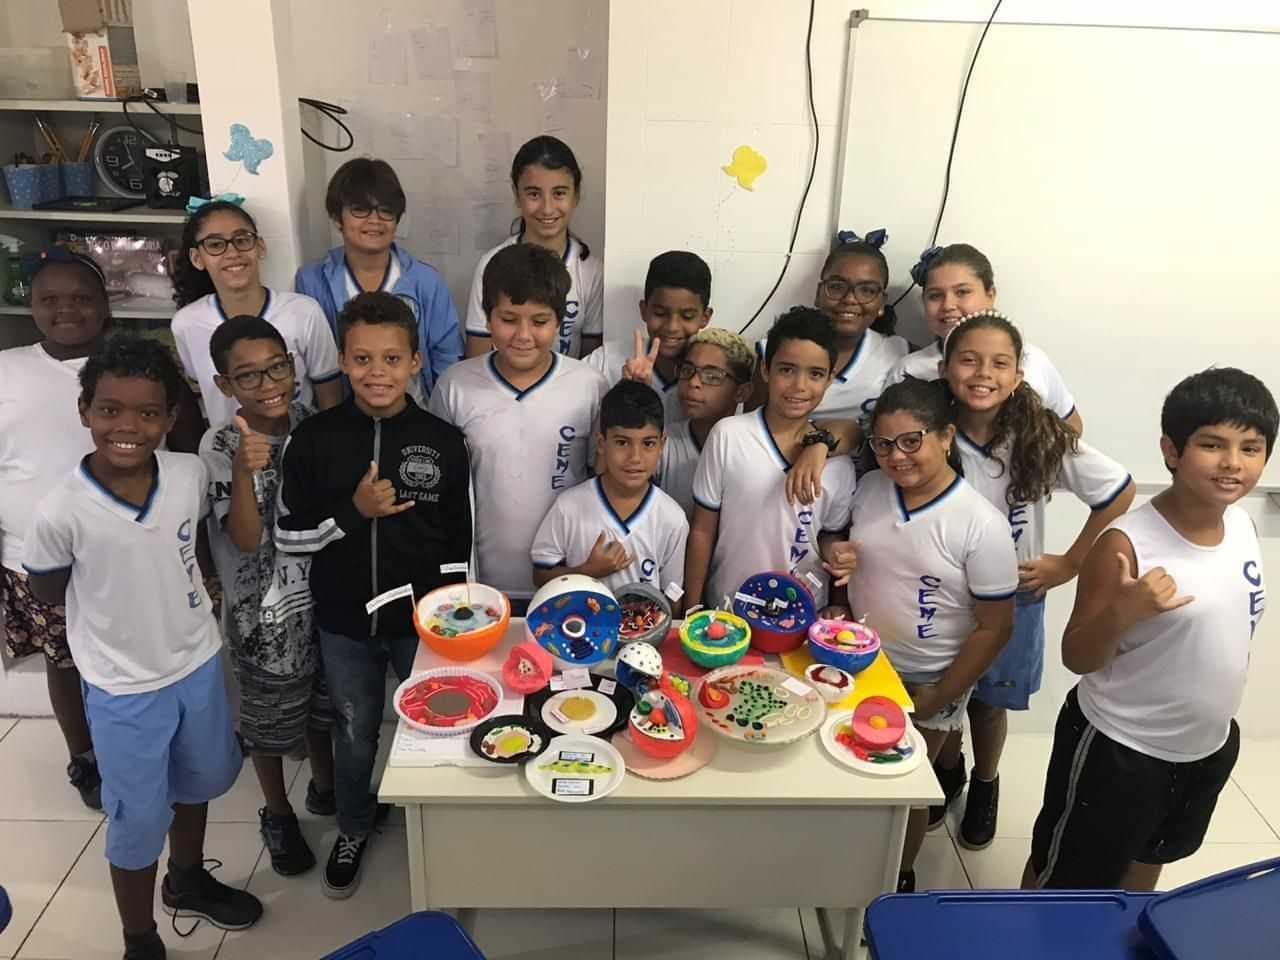 CENTRO EDUCACIONAL MUNDO ENCANTADO - foto 13